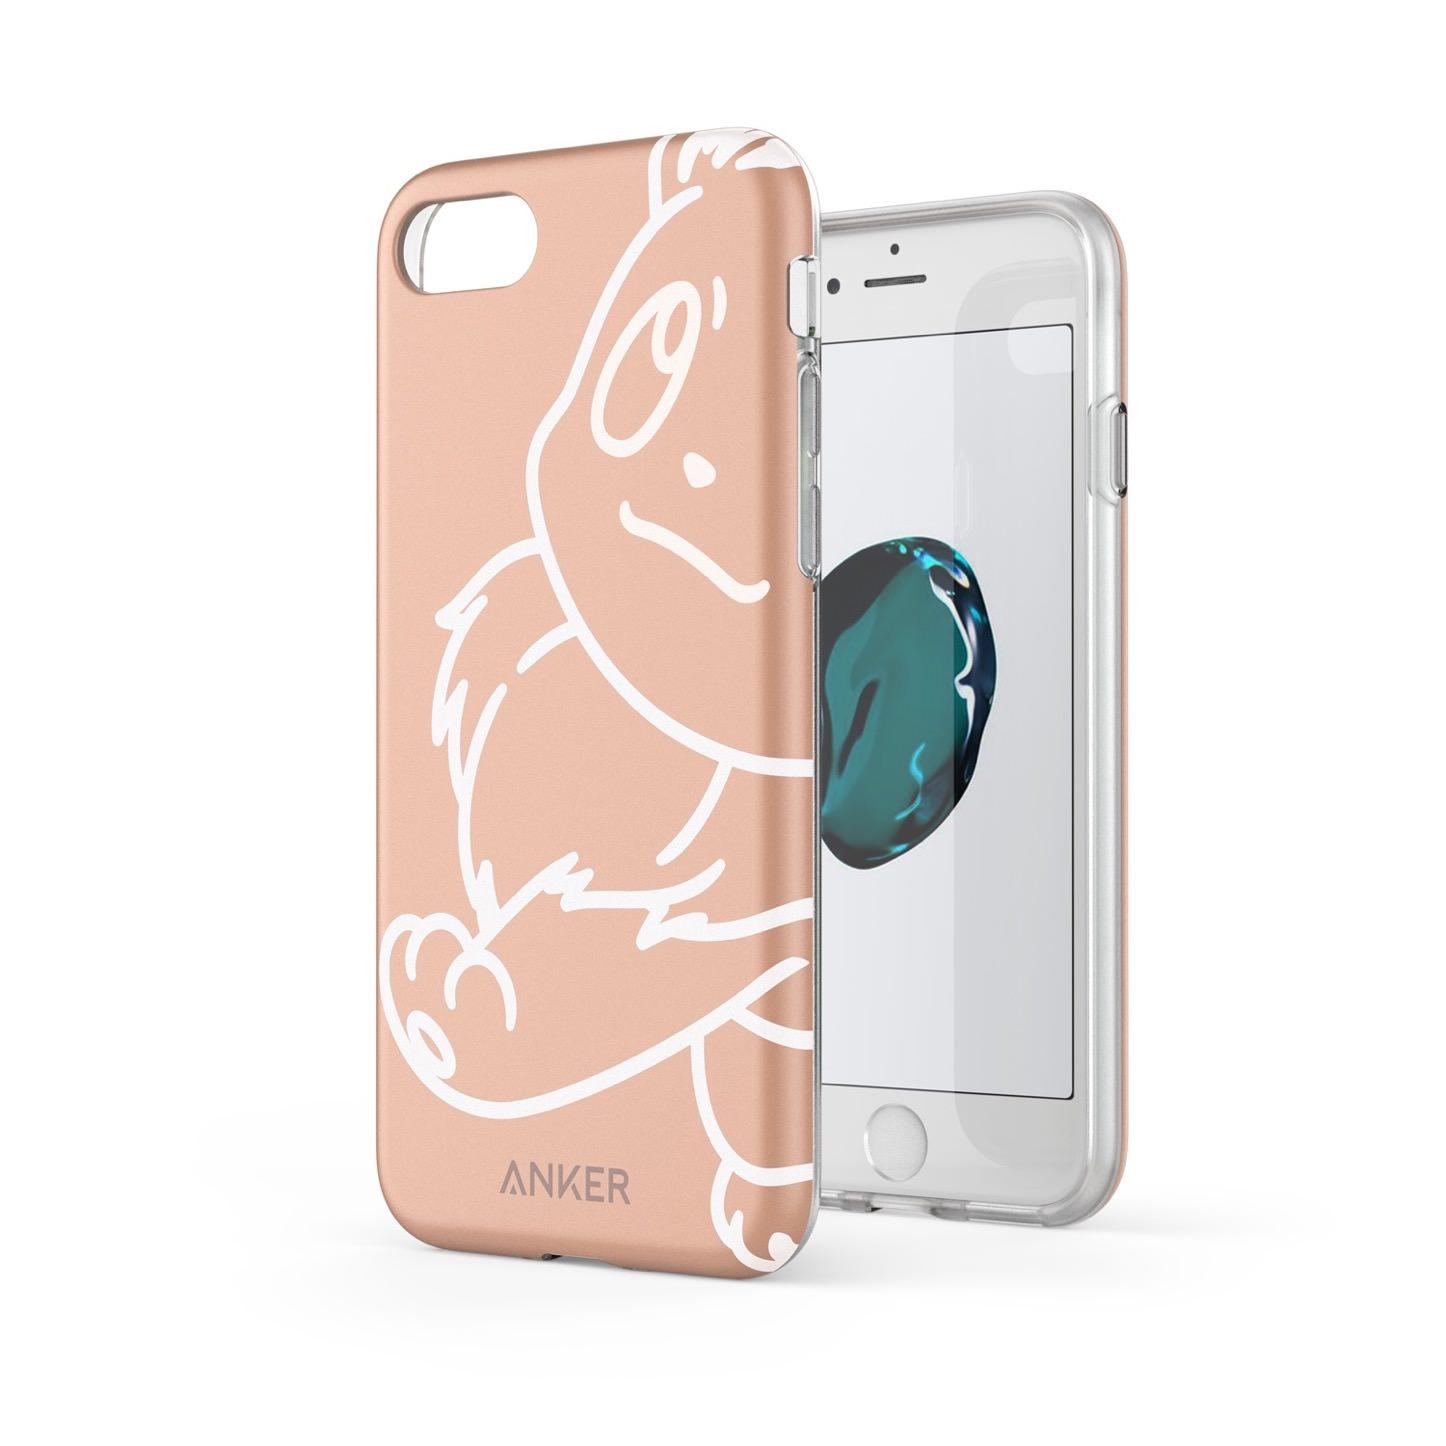 Anker-Pokemon-Mobile-Accessories-15.jpg